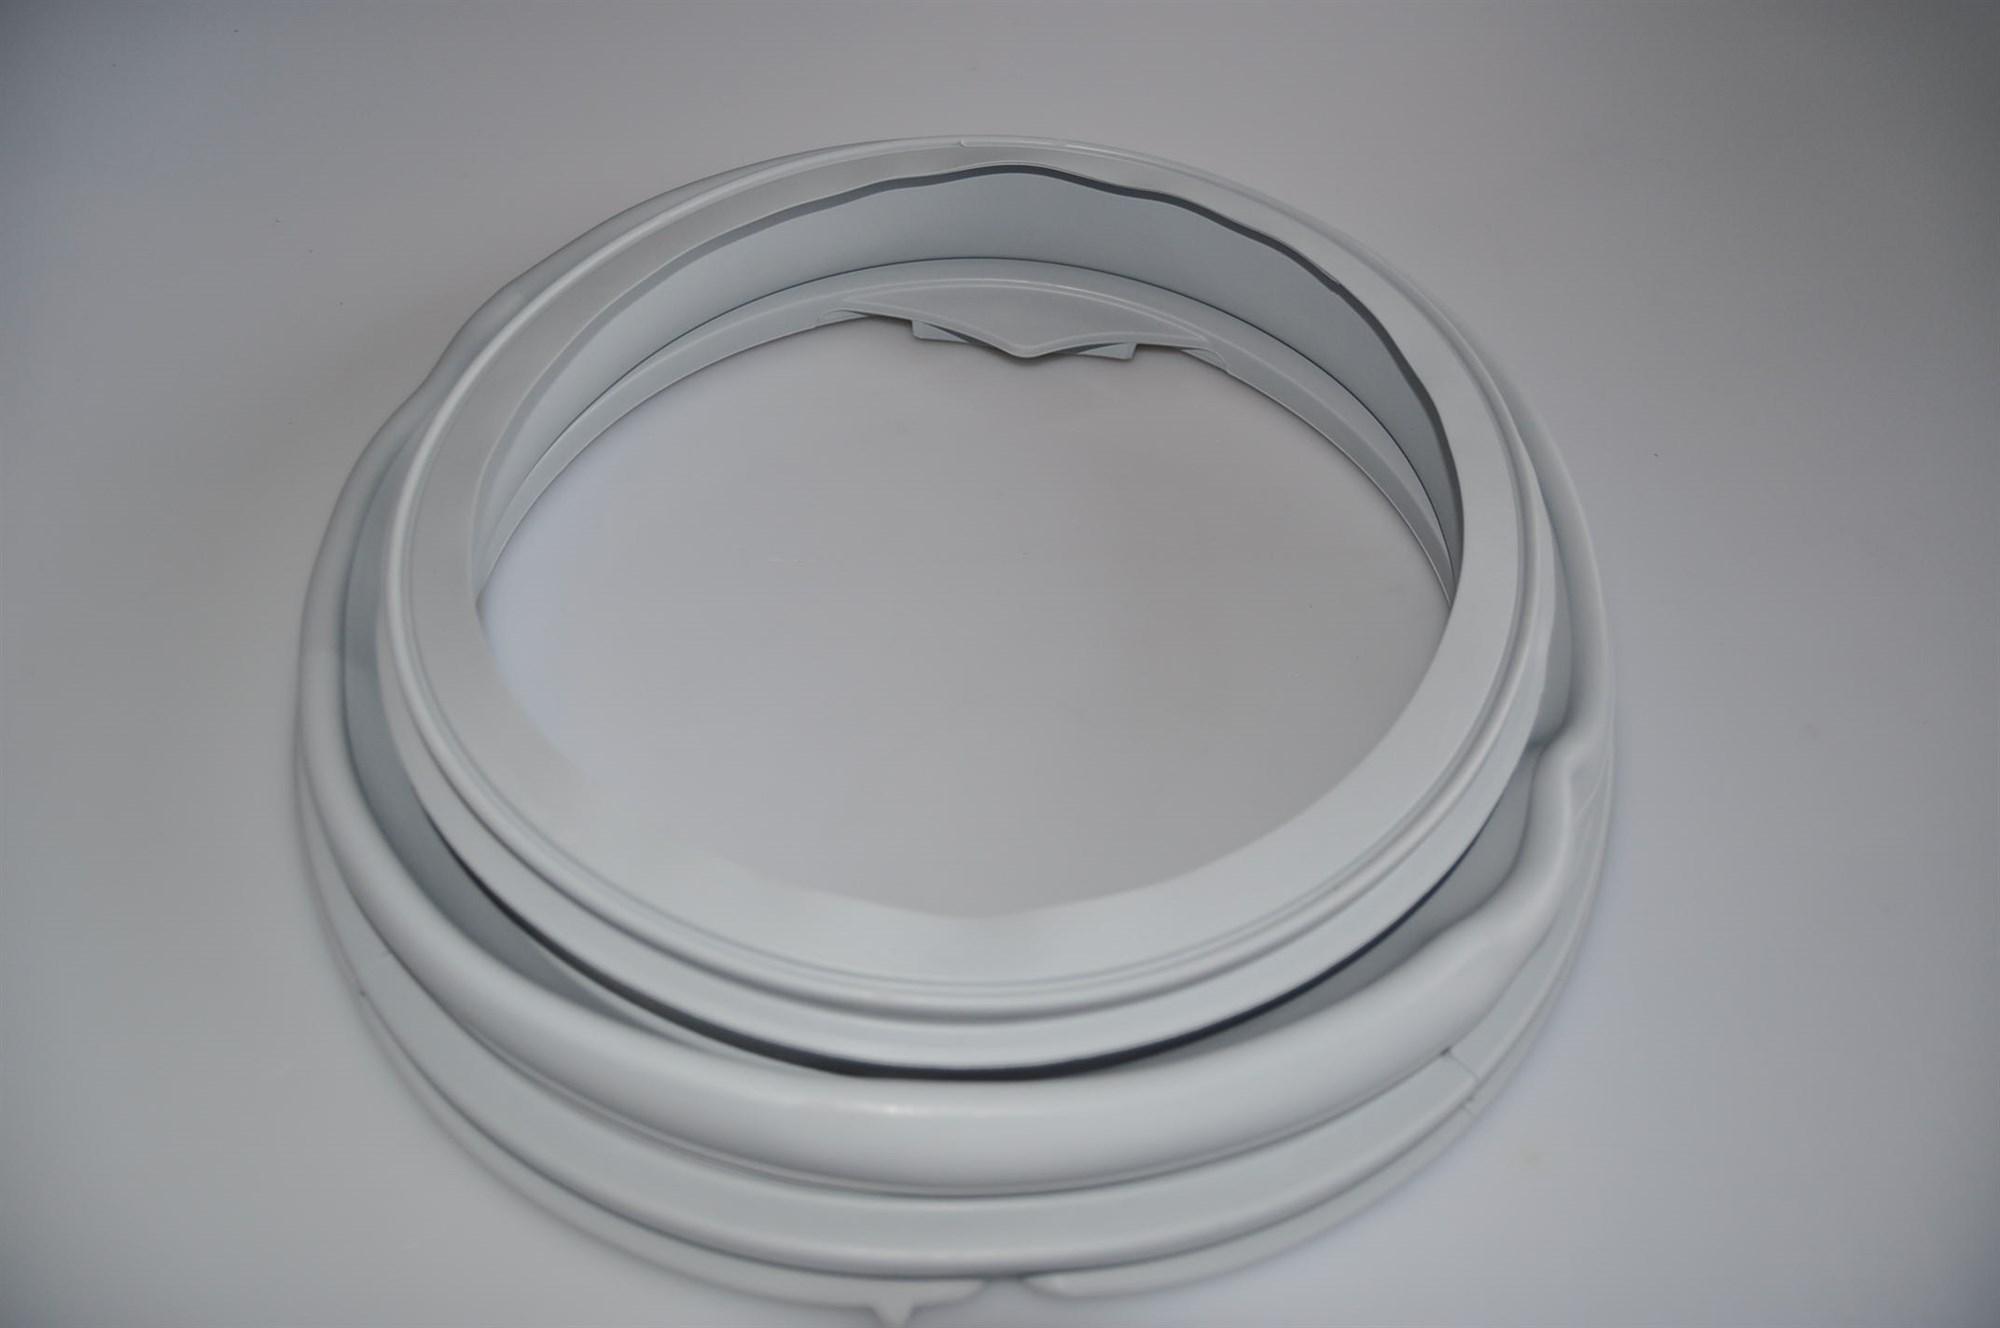 dichtungsring whirlpool waschmaschine gummi. Black Bedroom Furniture Sets. Home Design Ideas